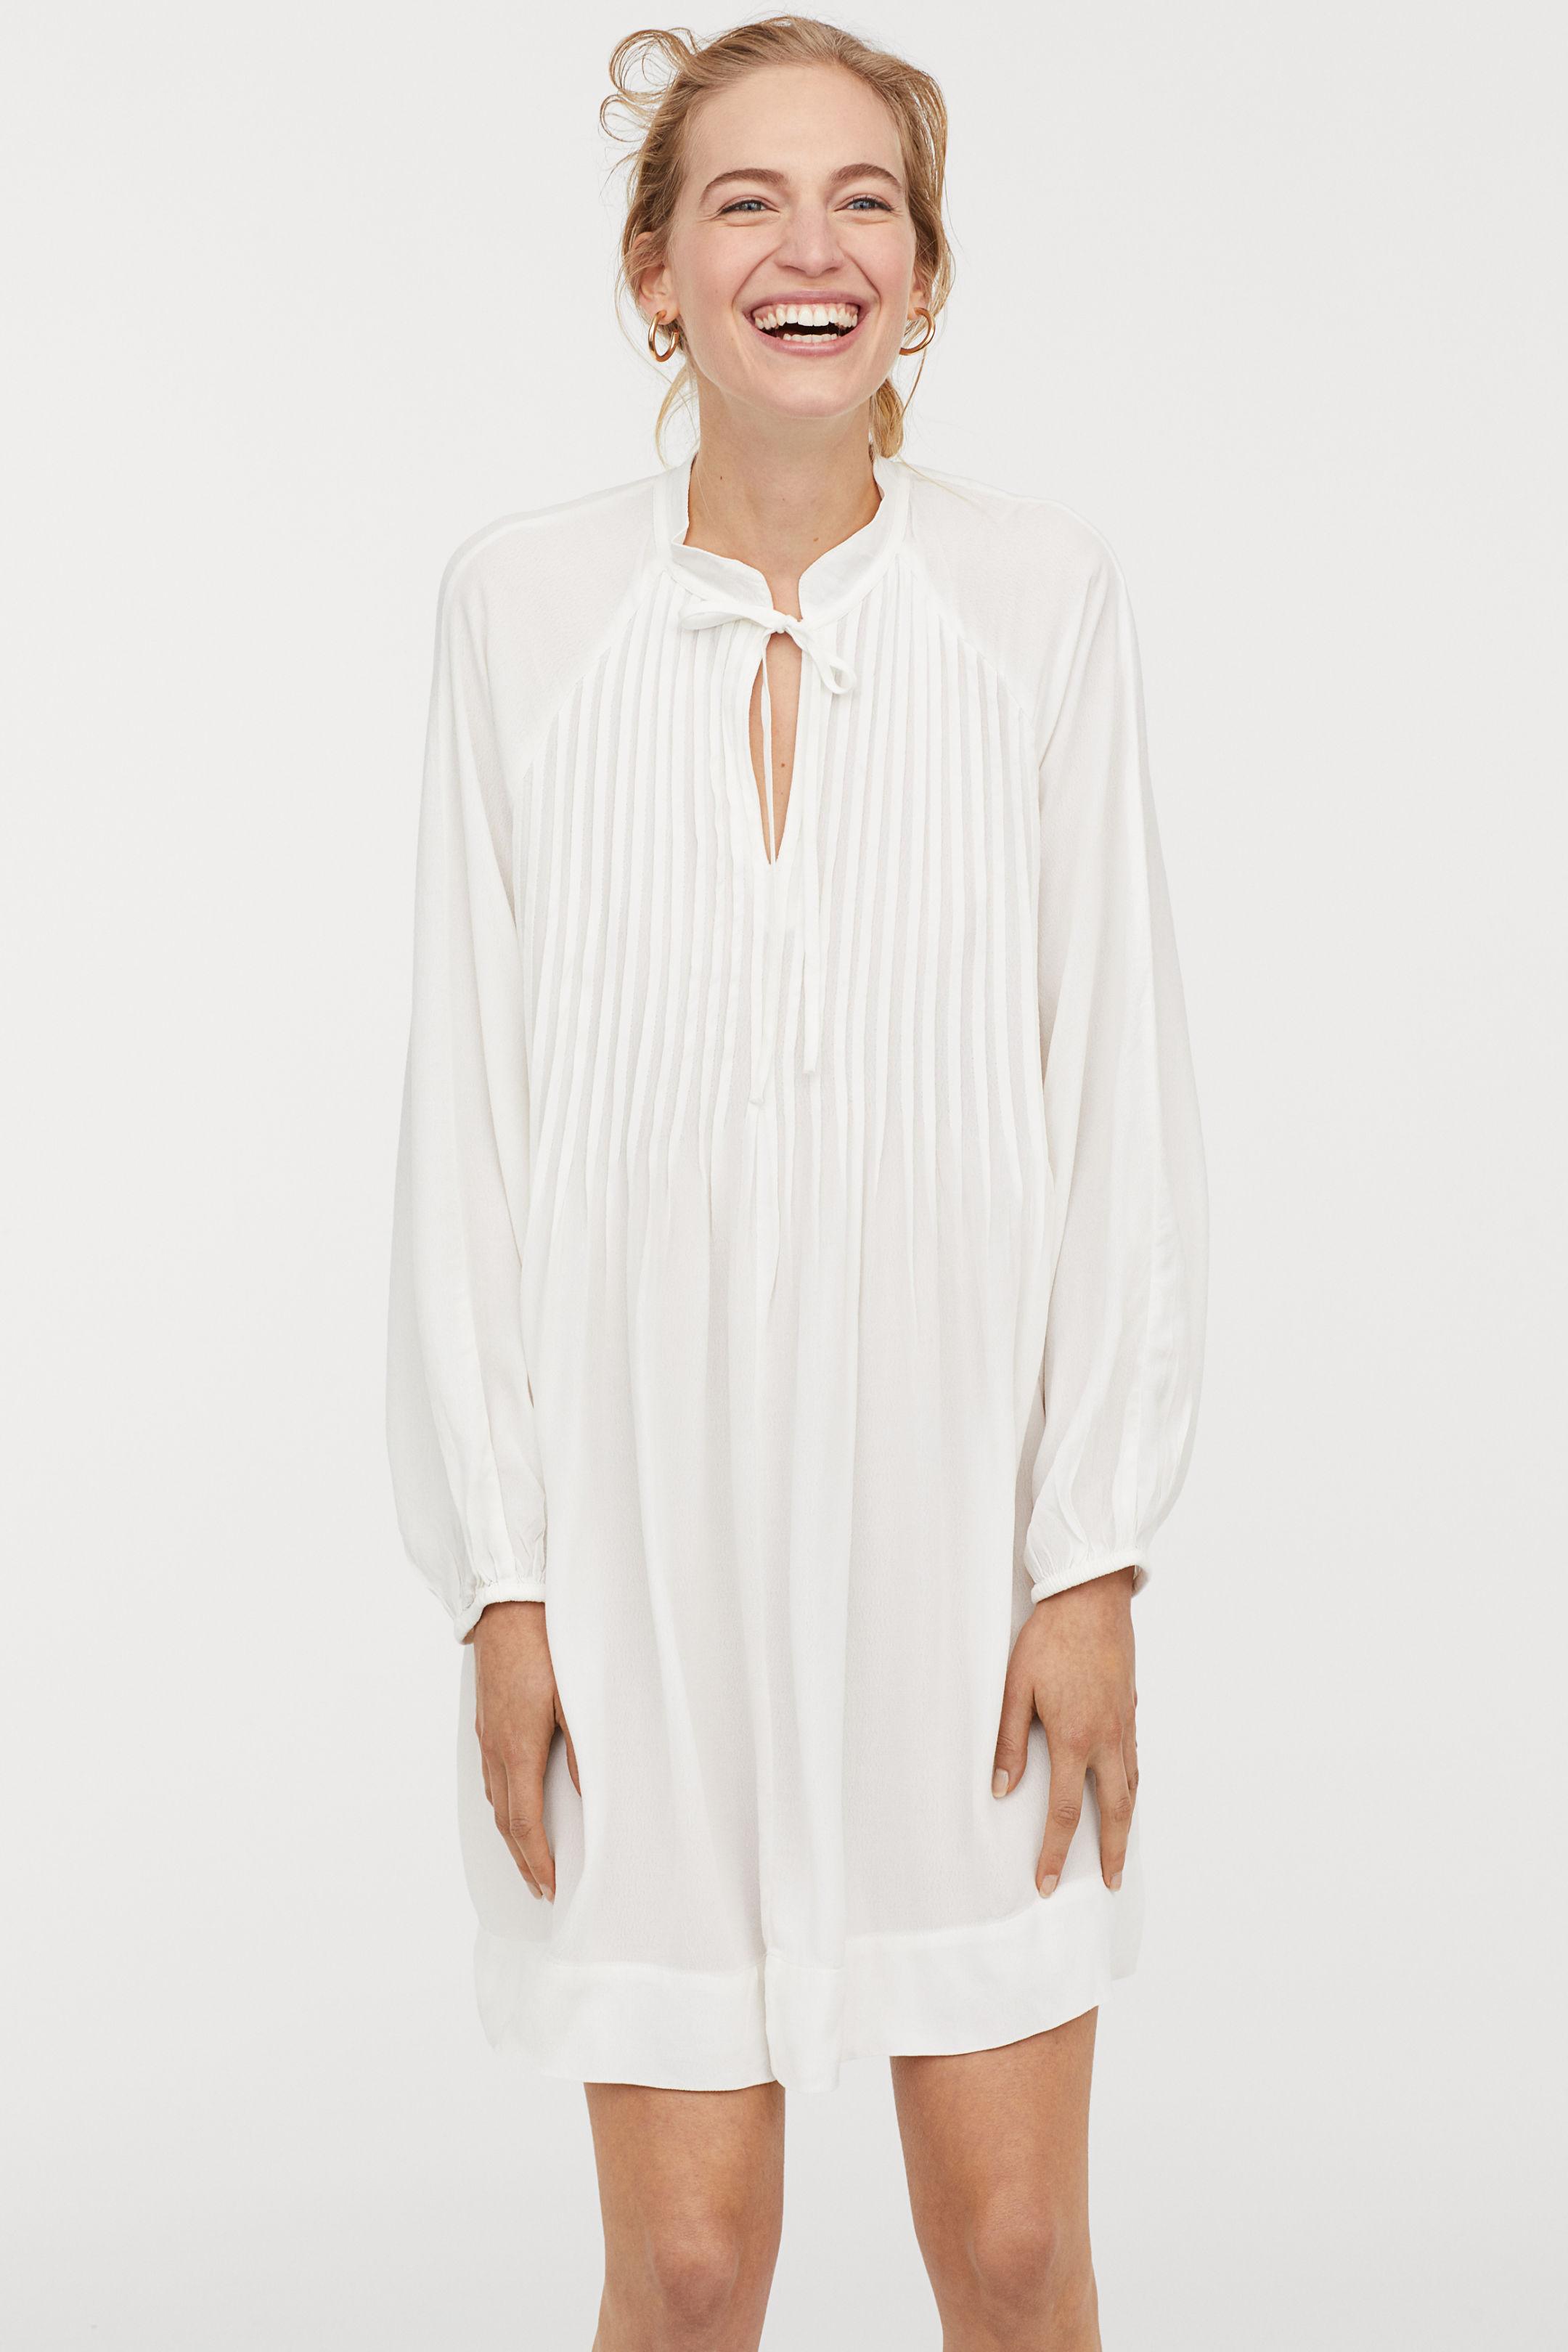 Abito chemisier bianco plissettato H&M